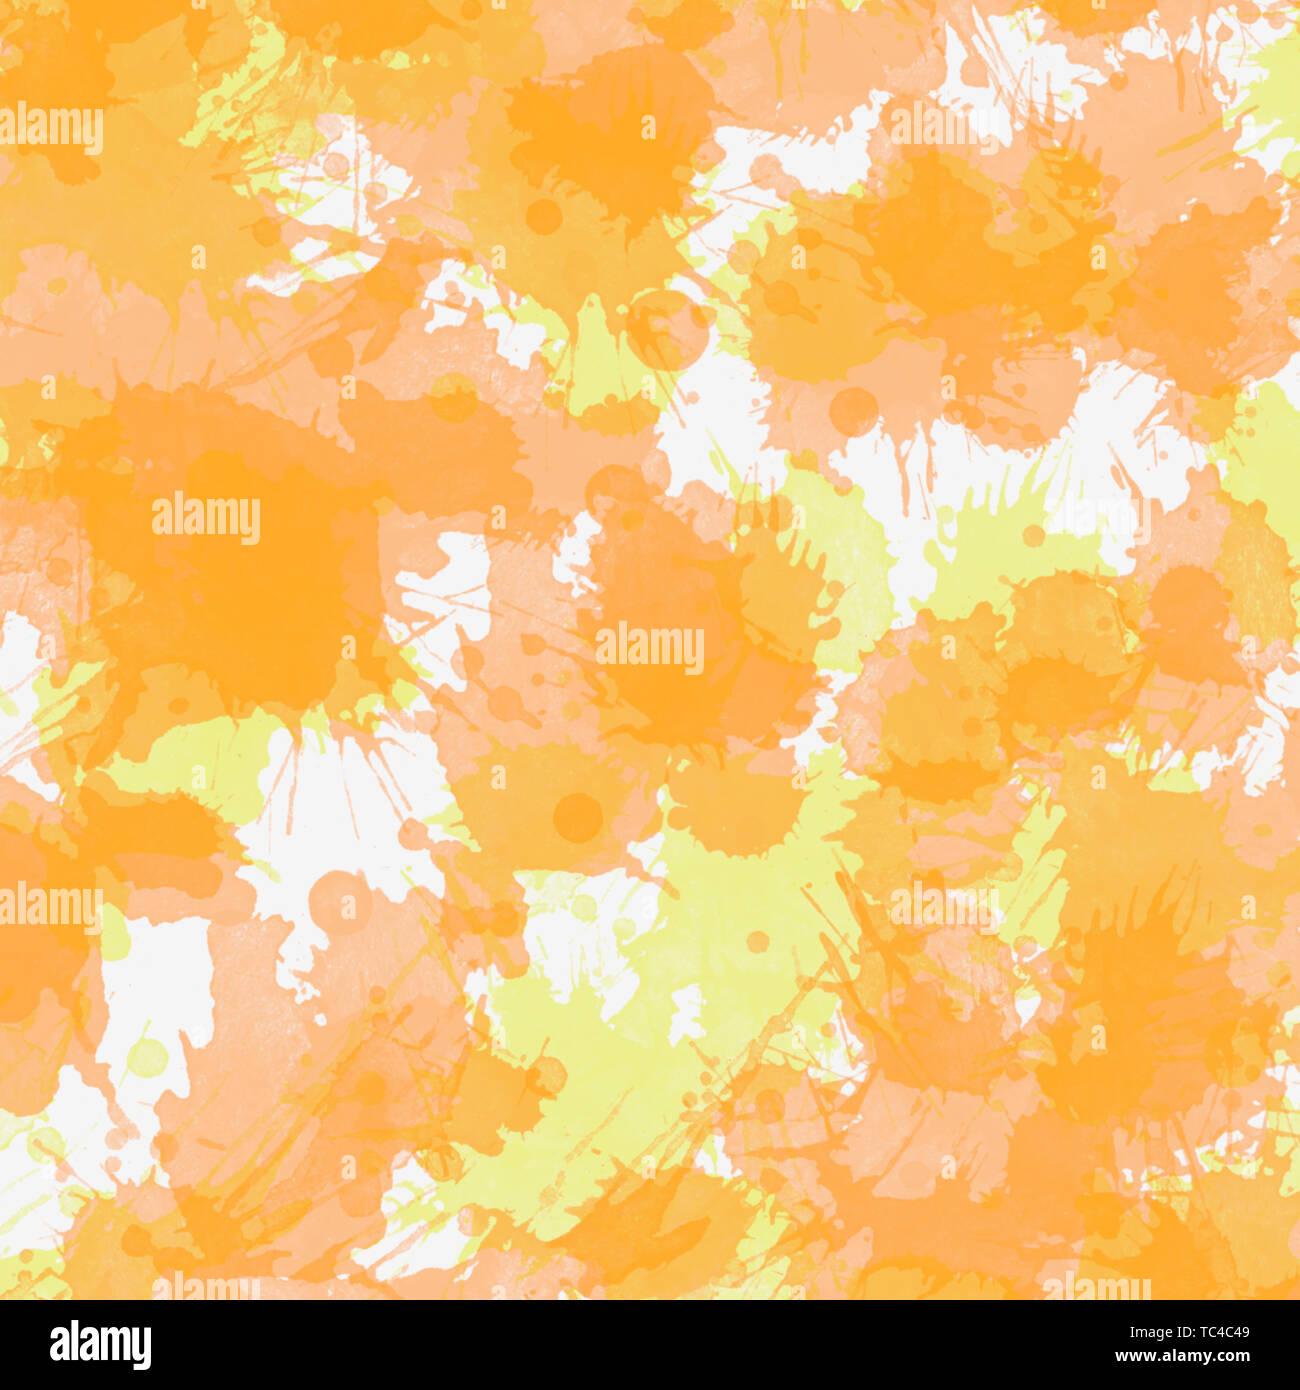 Abstract Orange Painting Art Splashes Of Paint On White